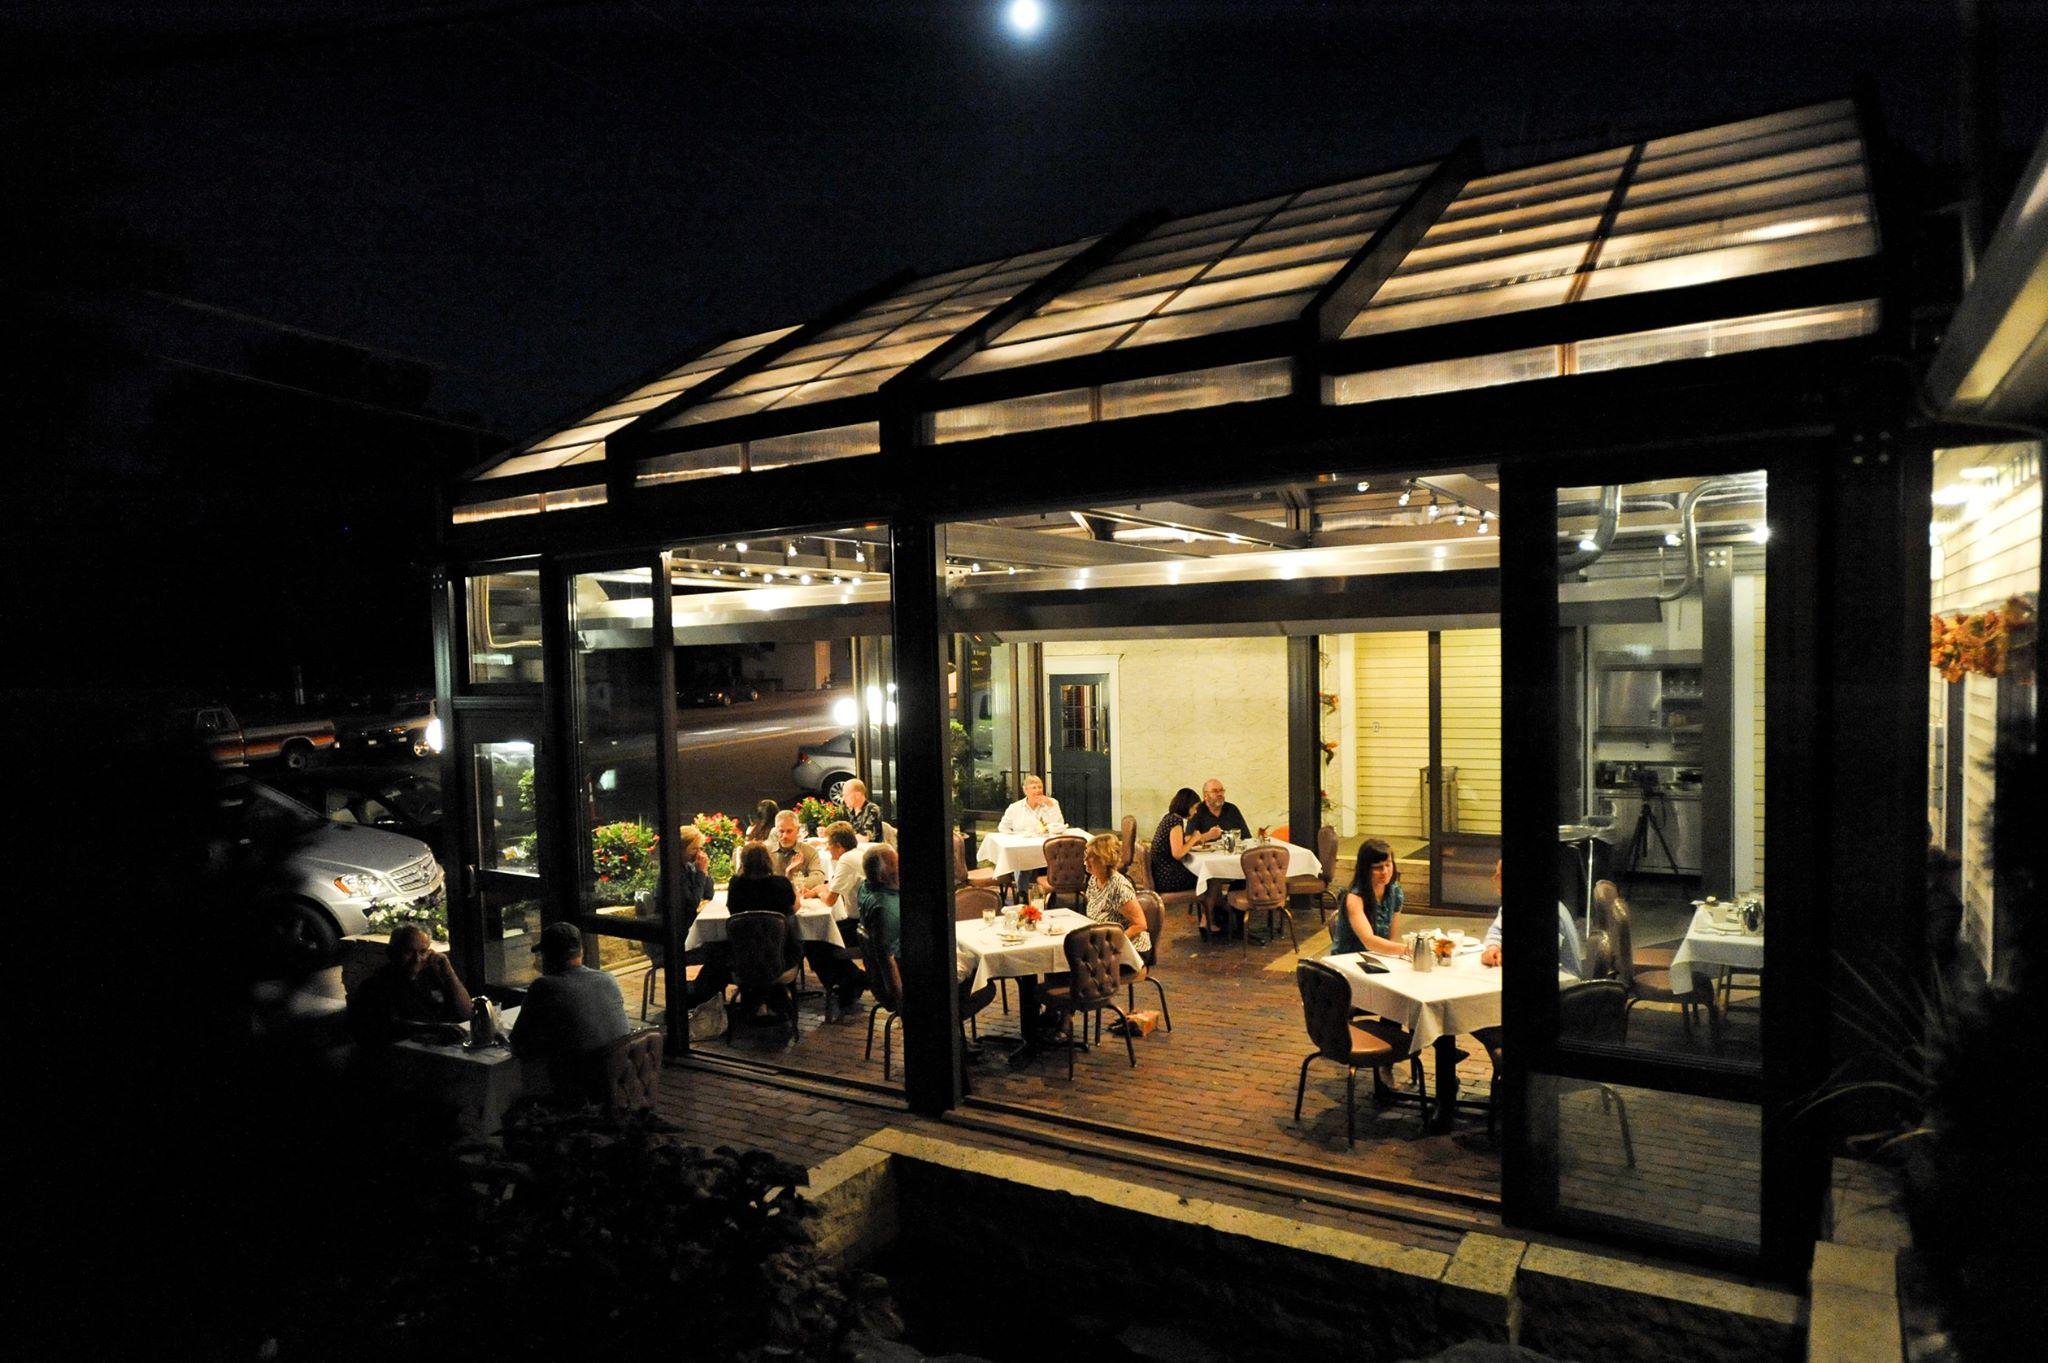 Patrons dining on restaurant patio at night